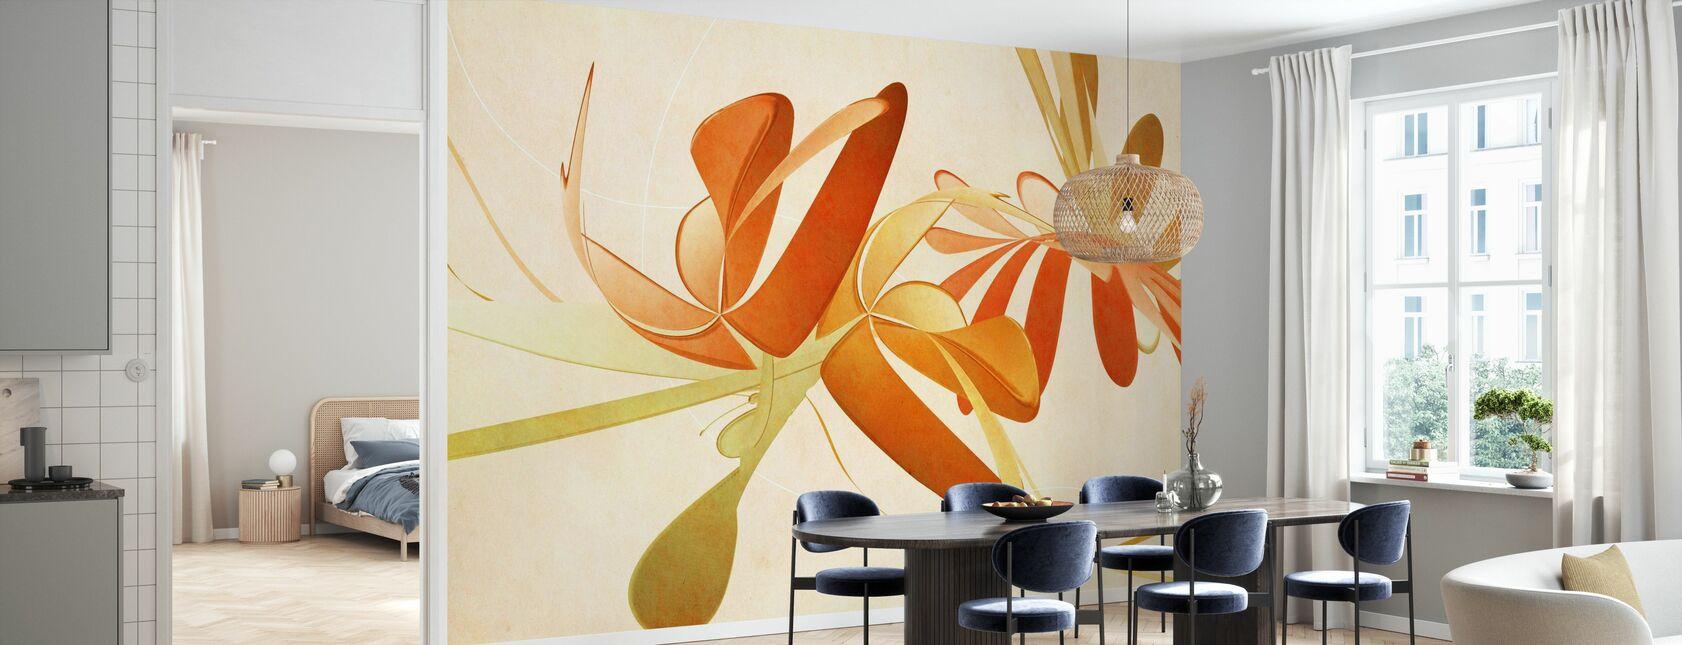 Positive - Wallpaper - Kitchen